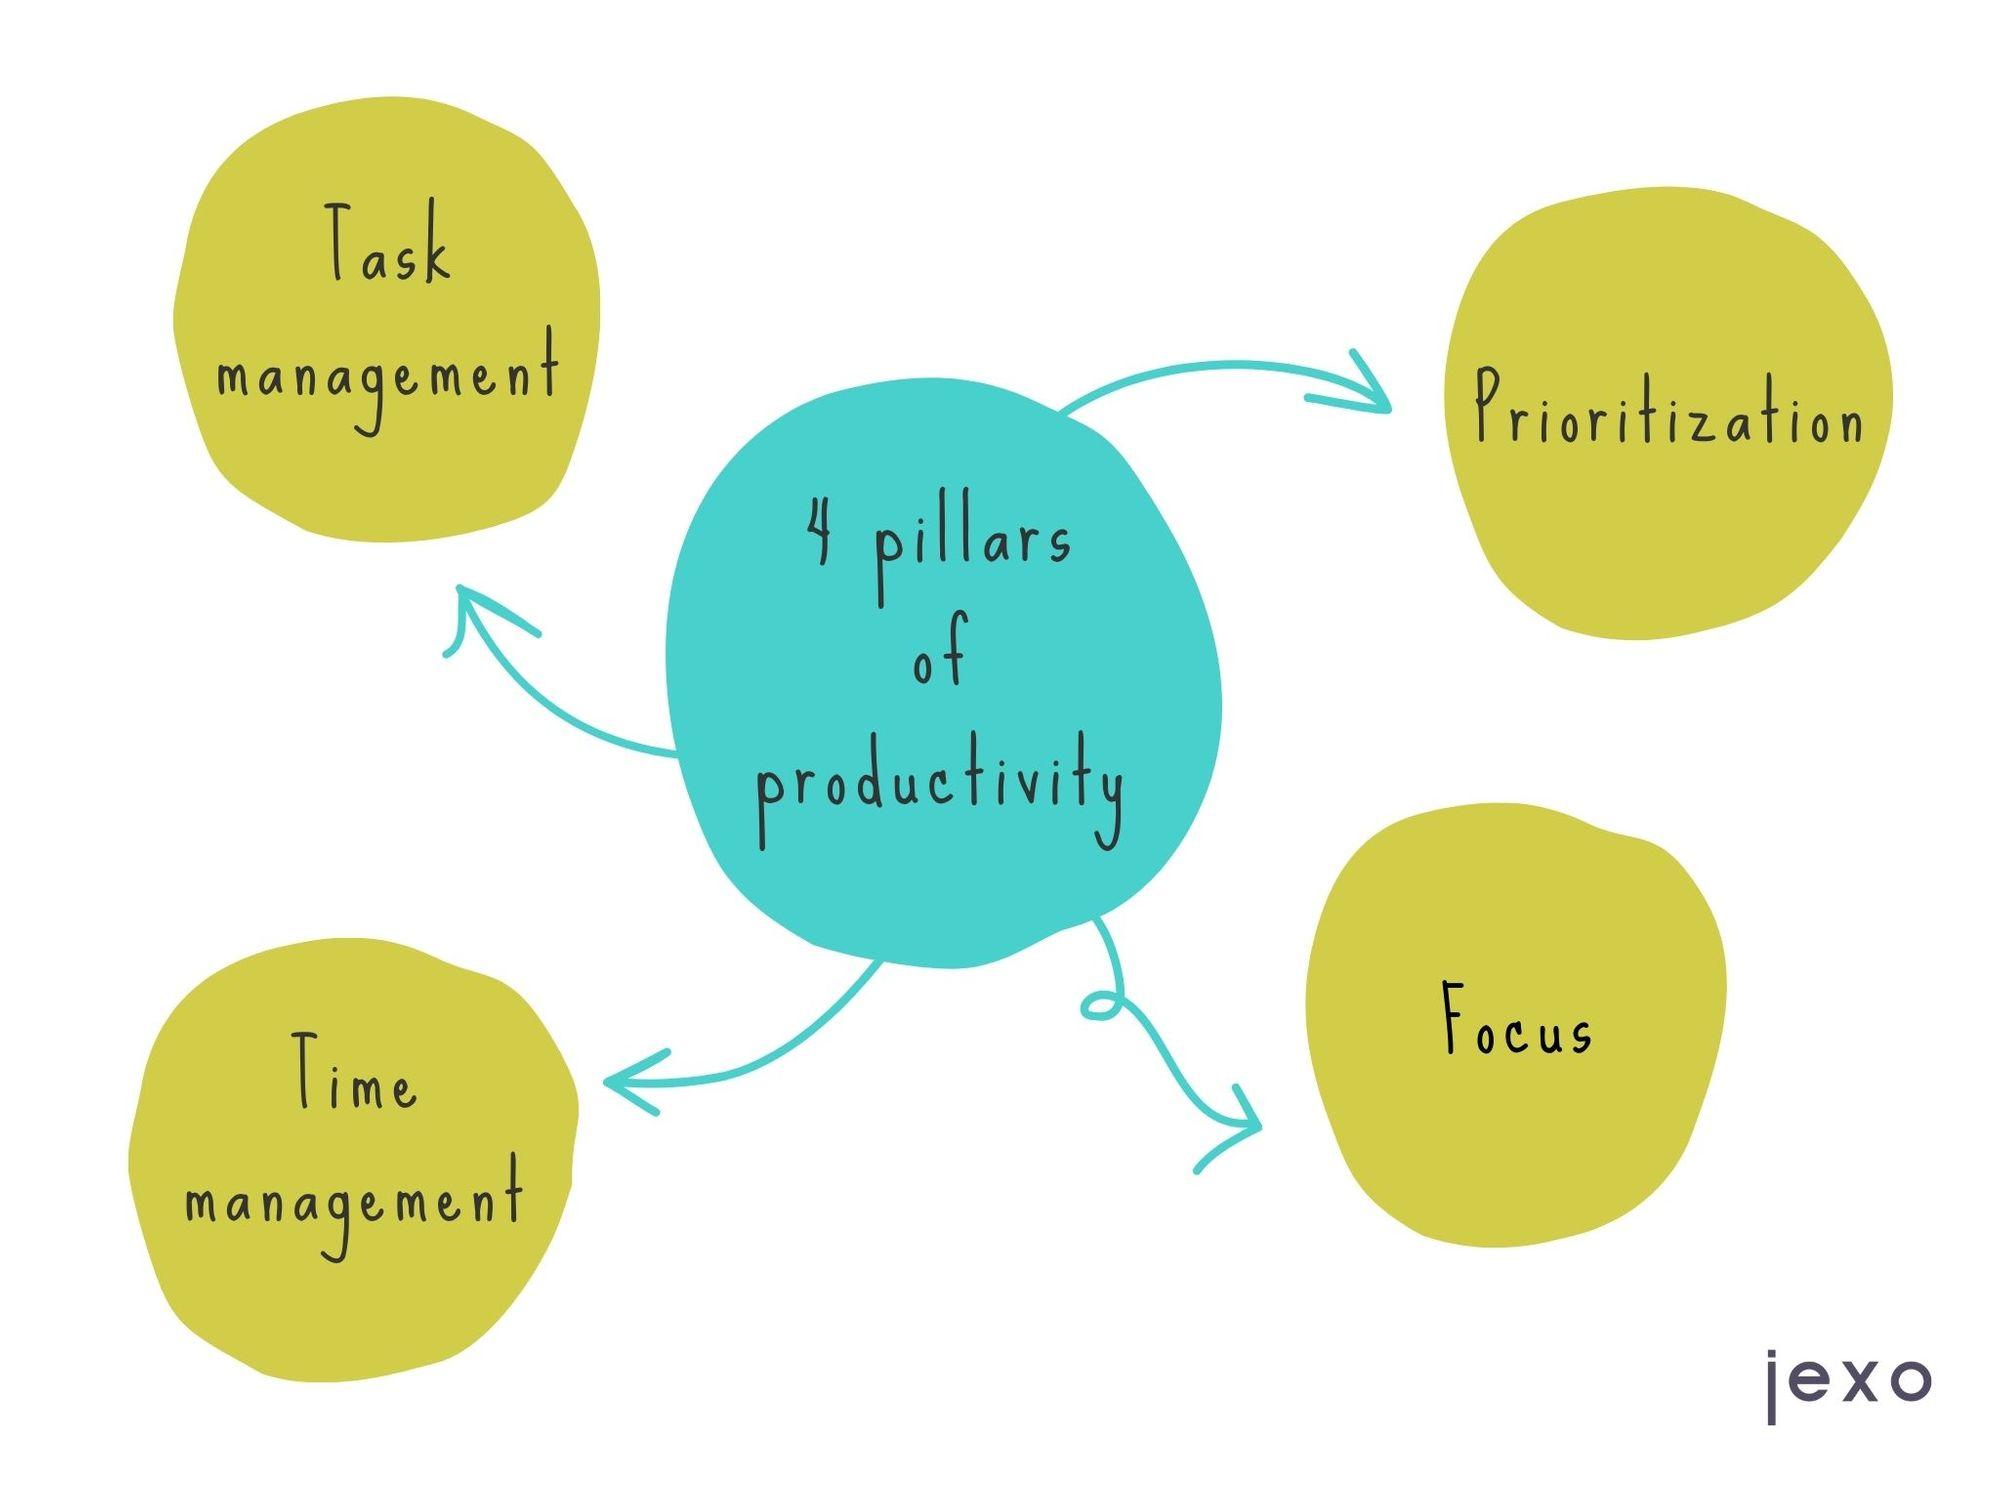 4 productivity pillars: task management, time management, focus, prioritization